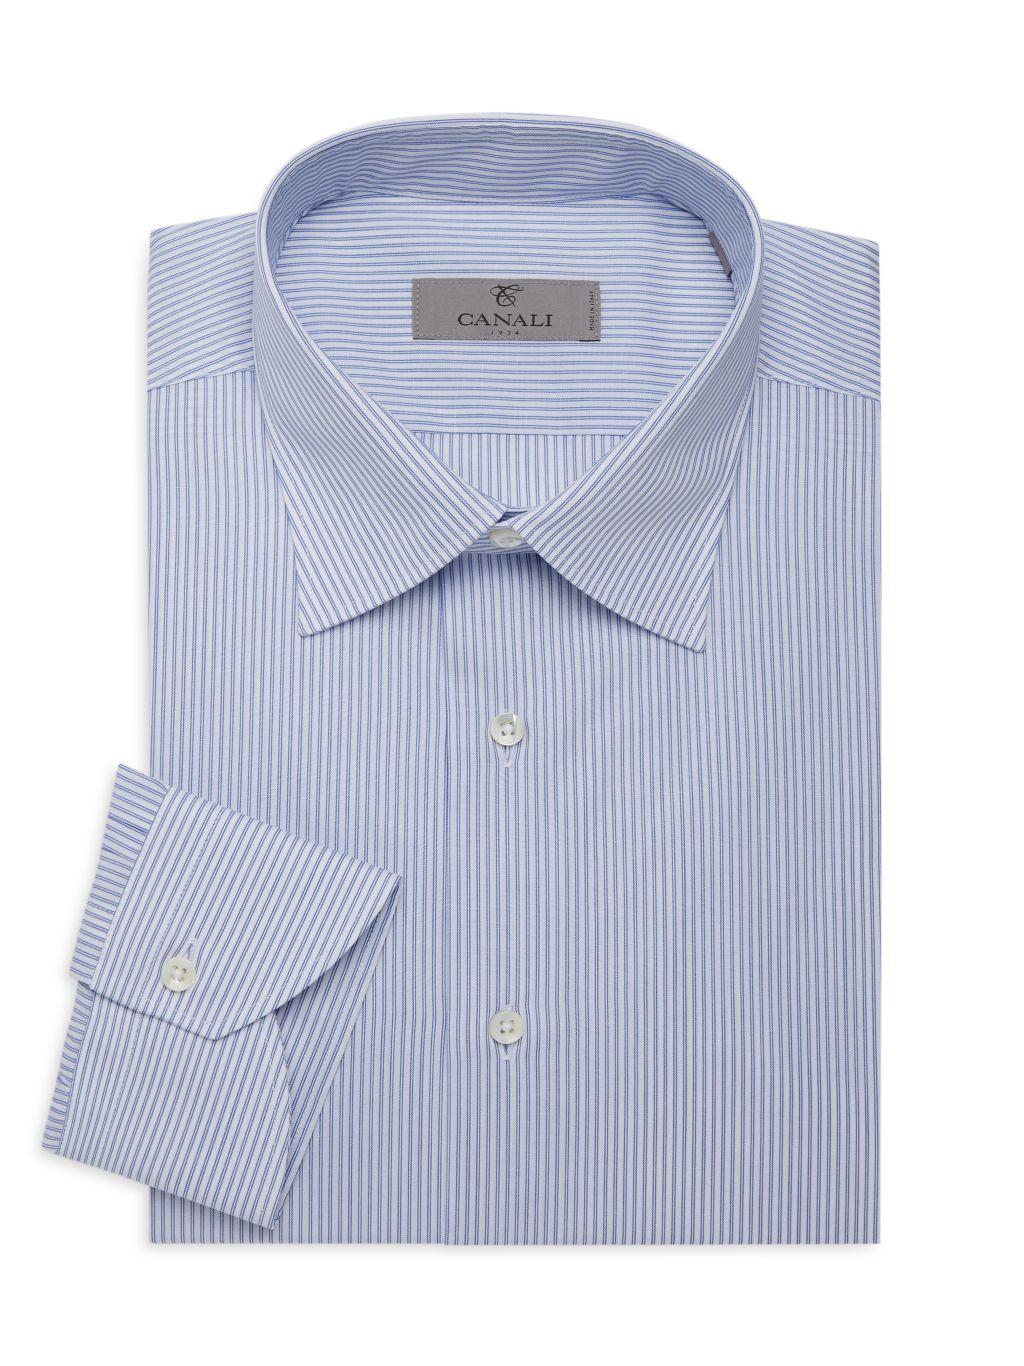 Canali Pinstriped Dress Shirt